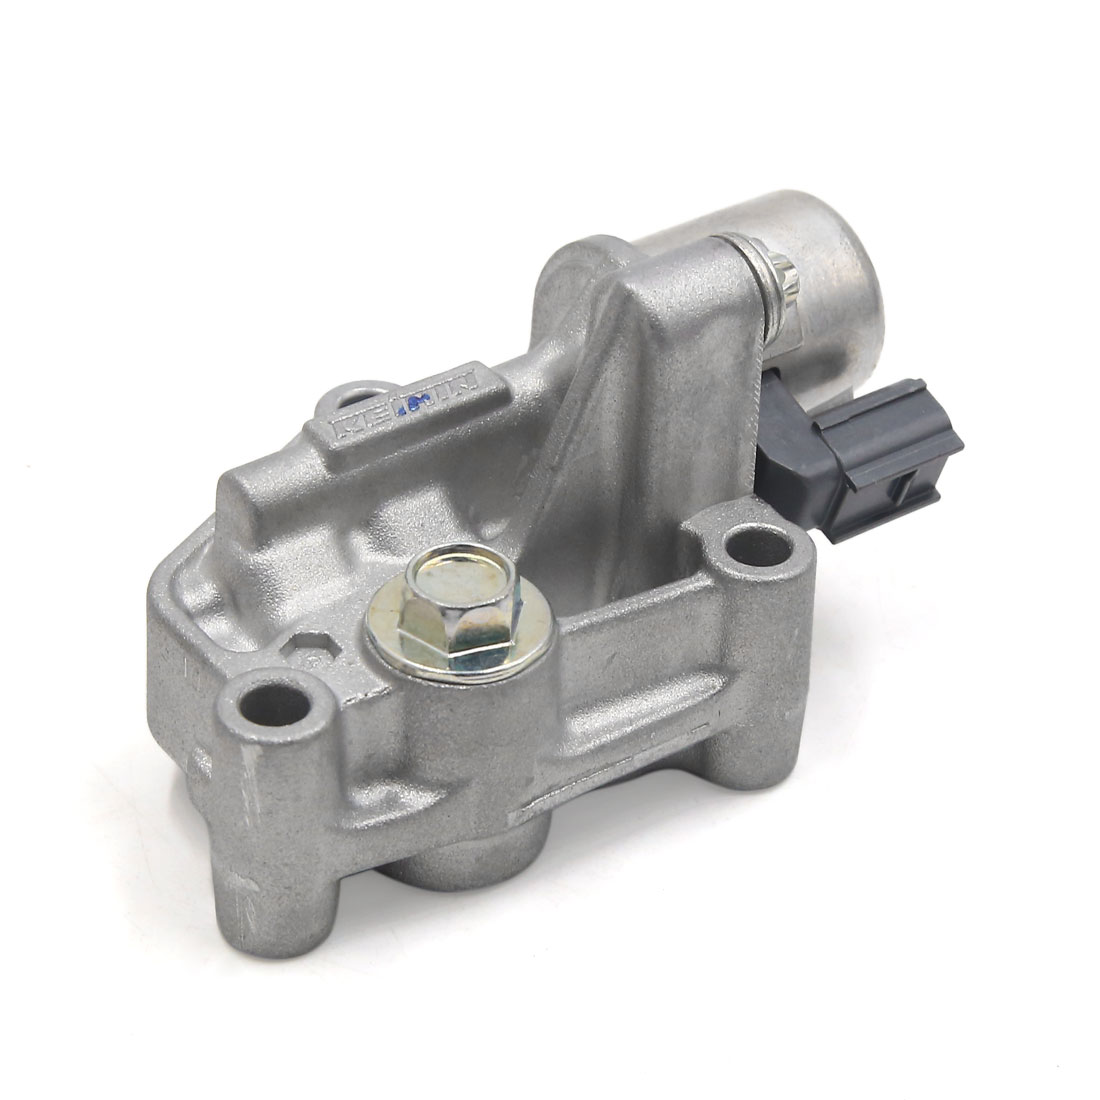 15810-RB0-003 Car Cylinder Head Sensor for Honda City 2009-2014 Fit 2009-2014